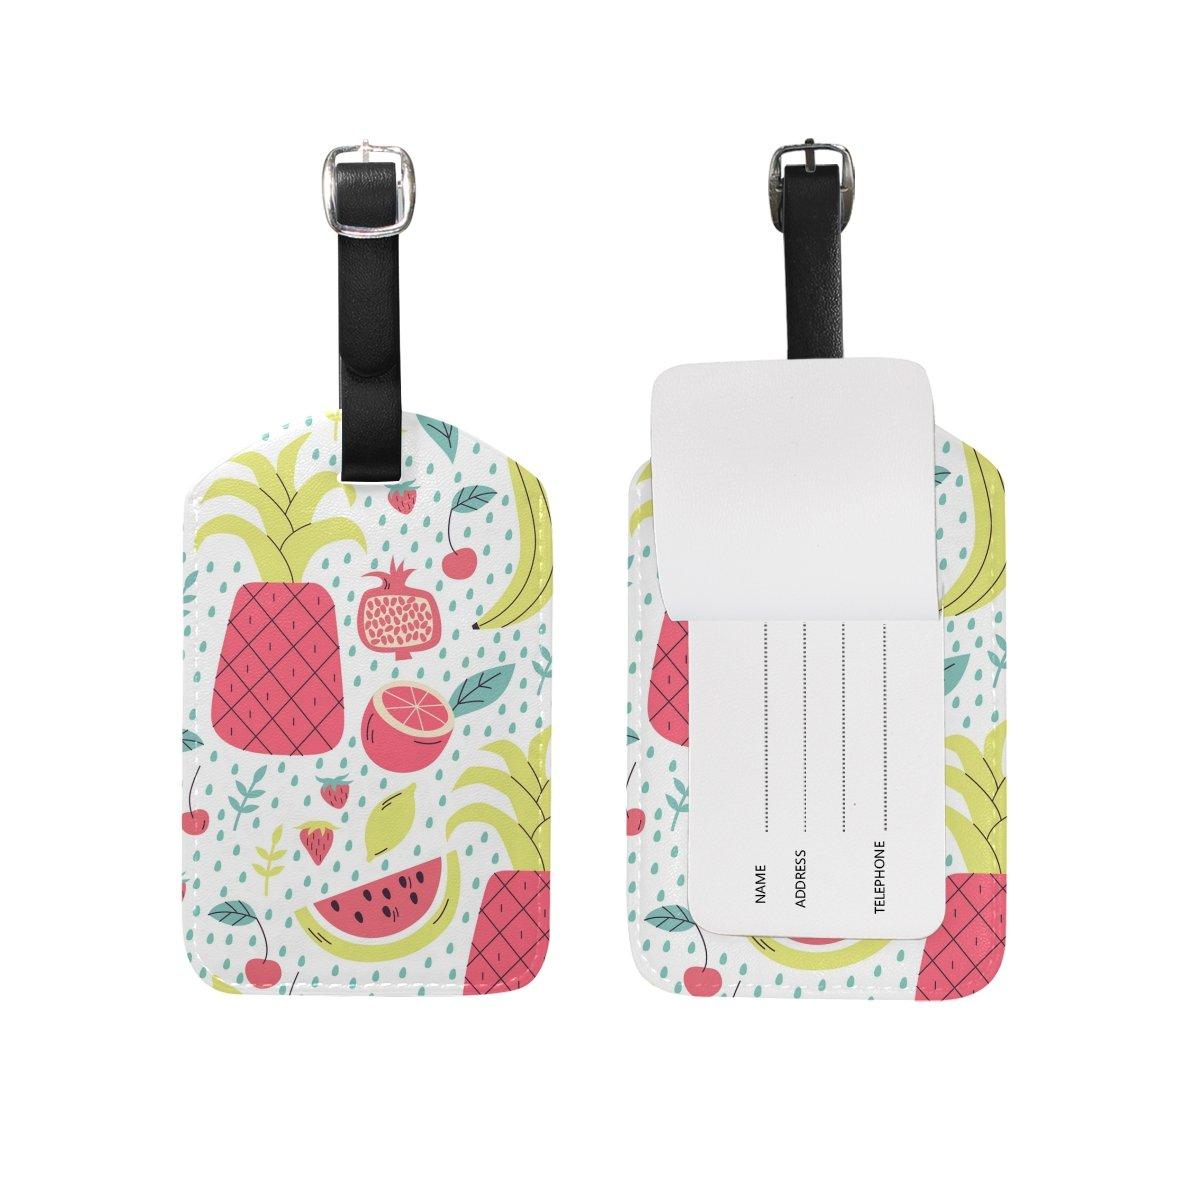 Saobao Travel Luggage Tag Fruit Seamless Pattern PU Leather Baggage Suitcase Travel ID Bag Tag 1Pcs